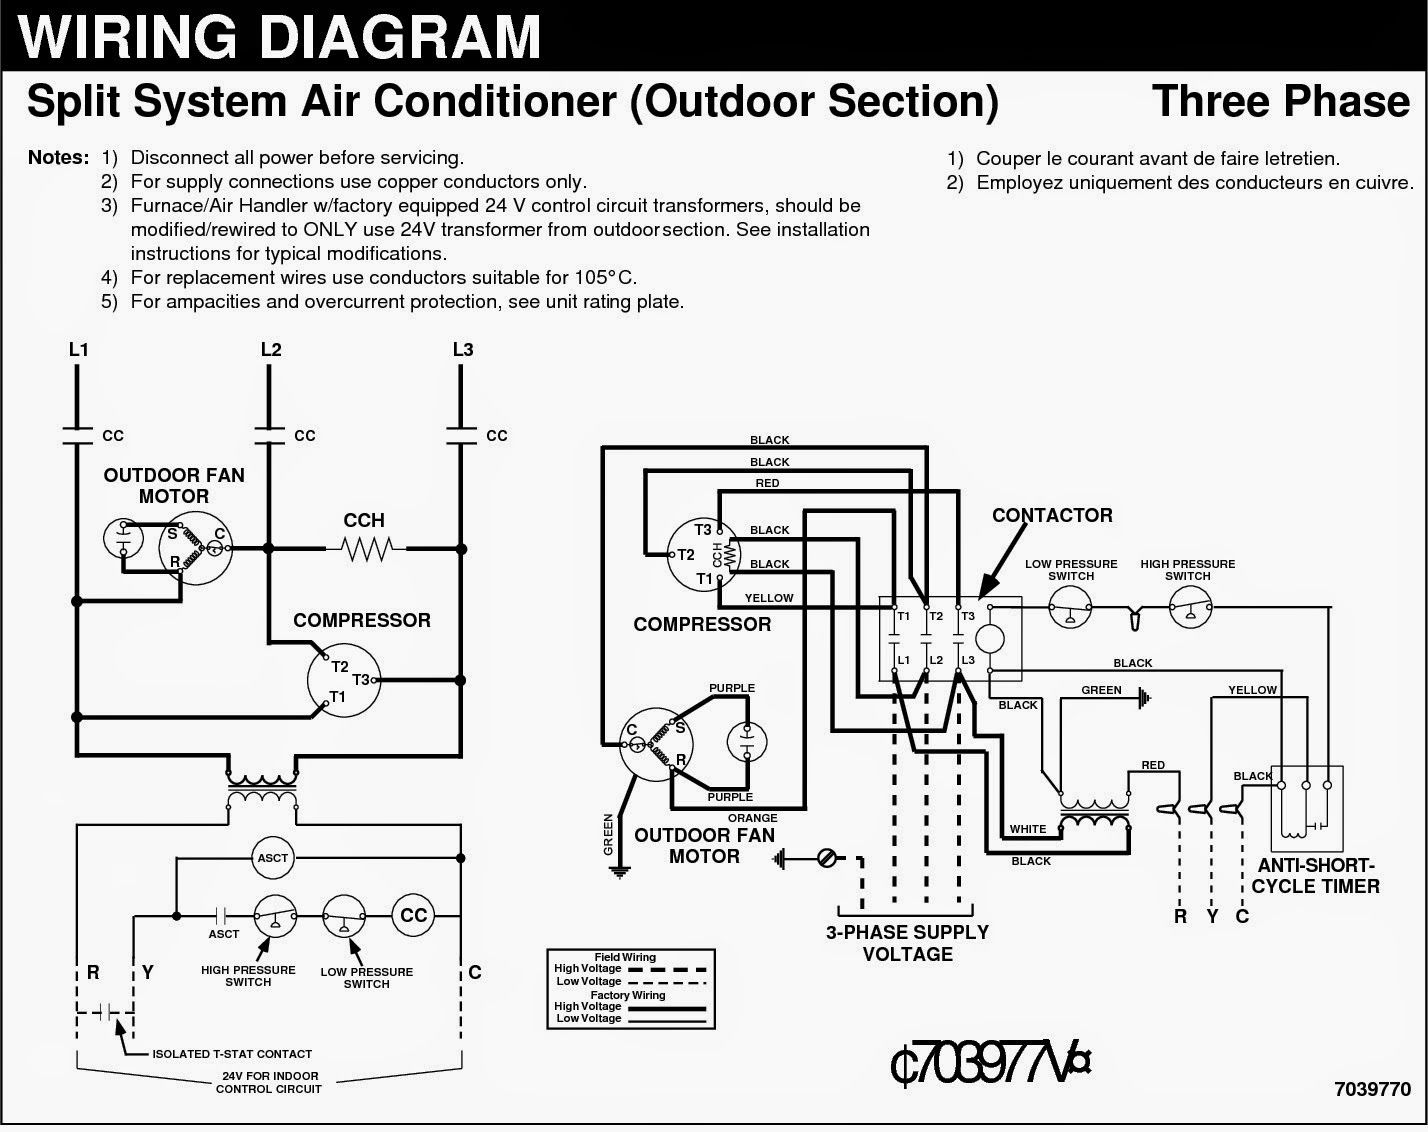 3 phase split ac wiring diagram mitsubishi triton ecu image result for of 380 volts 10 tons